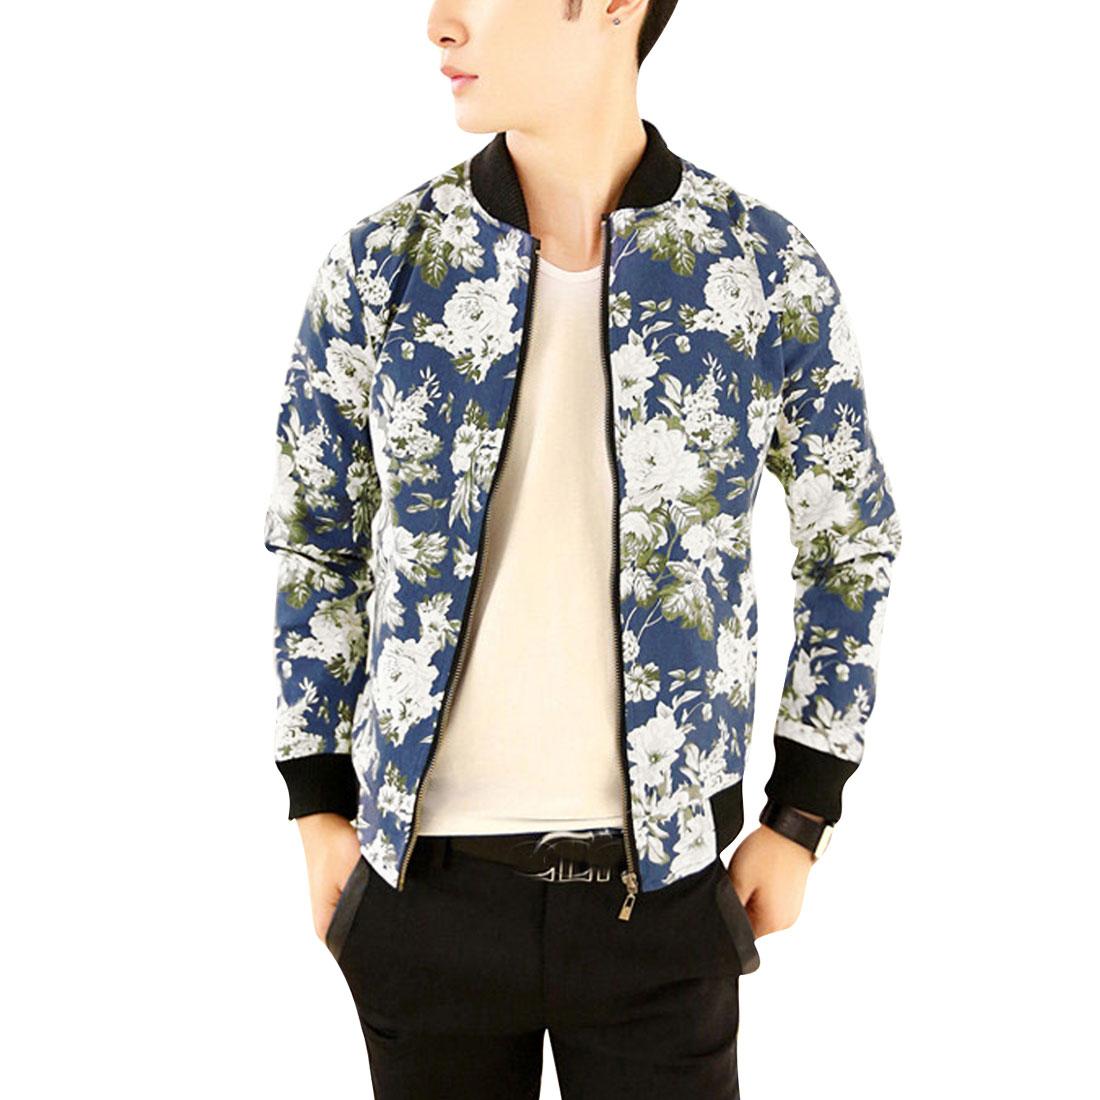 Men's Stylish Zip Up Stand Collar Blue Flower Pattern Jacket S